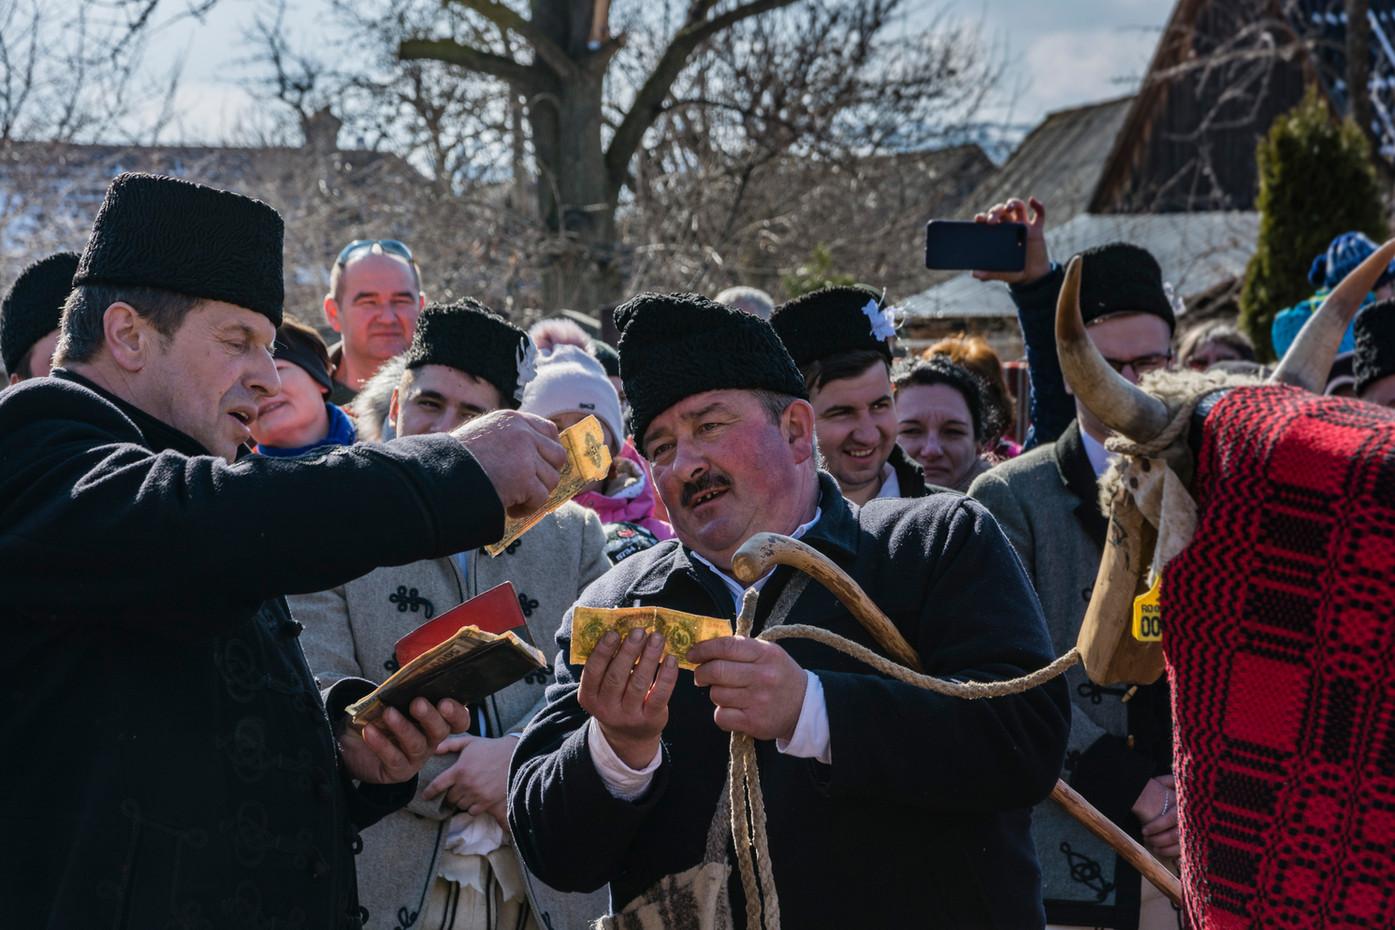 Csíkszentdomokos / Sândominic Harghita county / Hargita megye / Județul Harghita Romania / Románia / România 2019